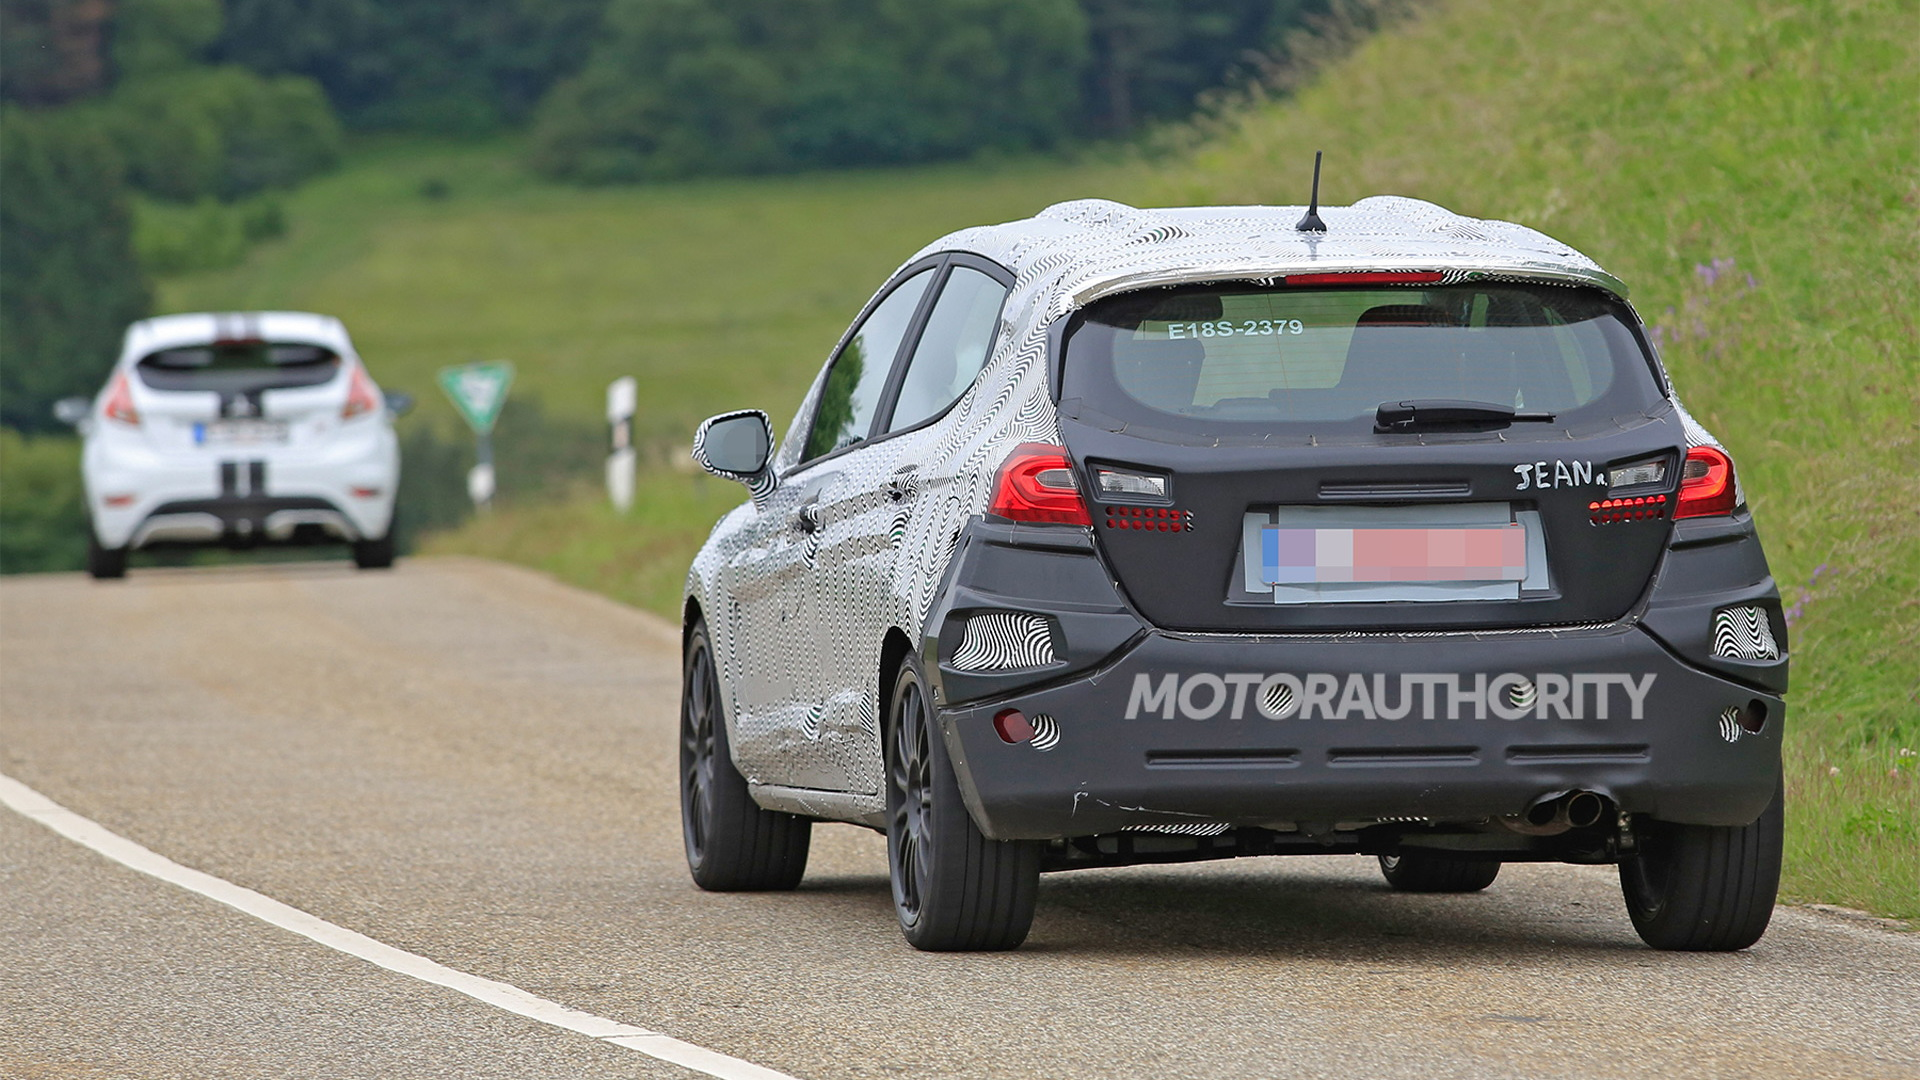 2018 Ford Fiesta ST spy shots - Image via S. Baldauf/SB-Median